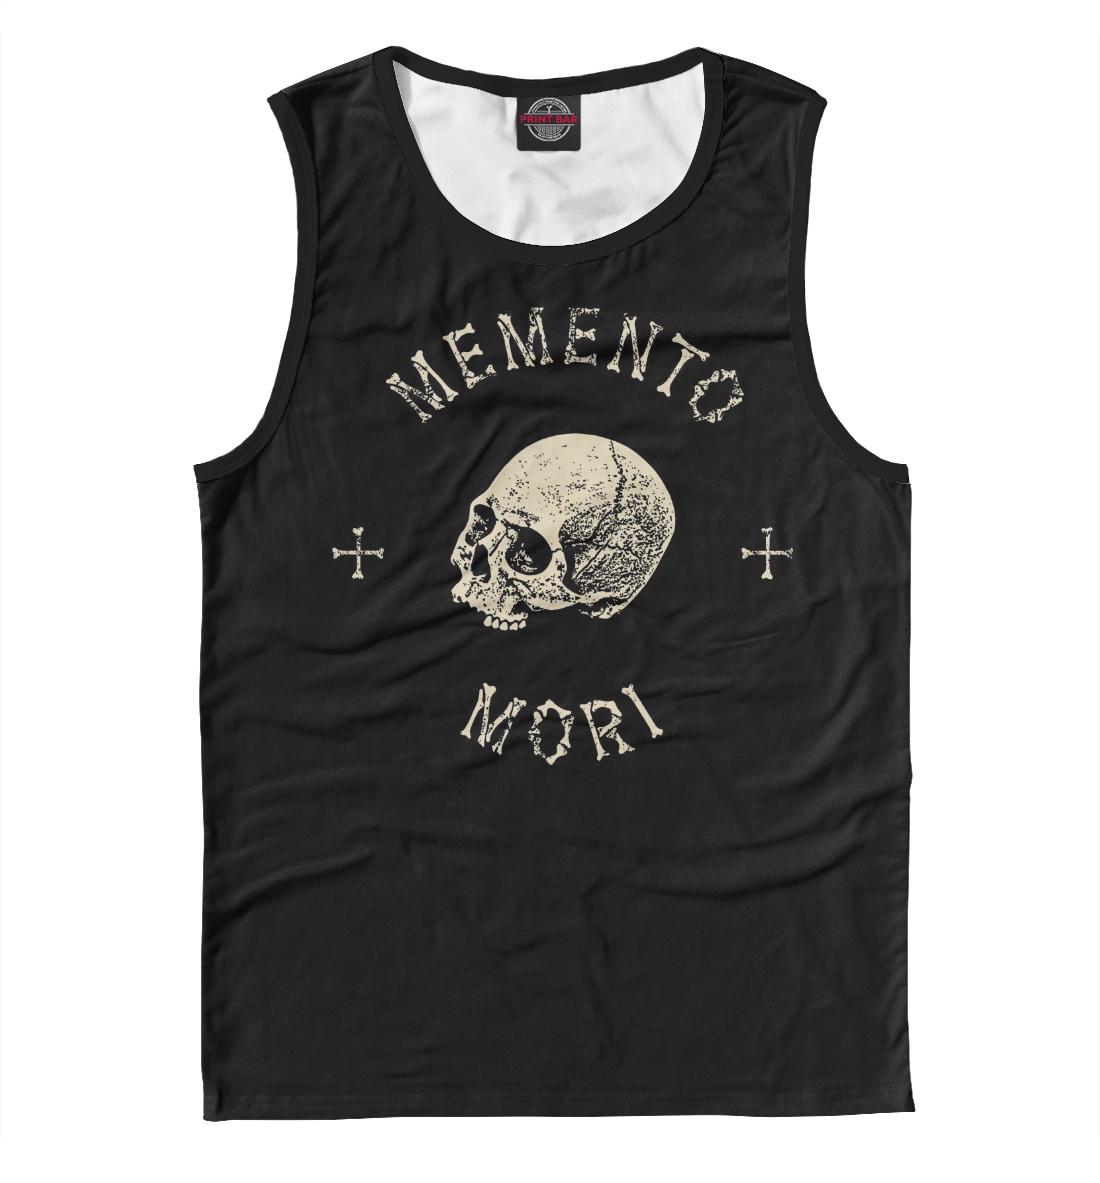 Купить Memento mori, Printbar, Майки, SKU-538470-may-2